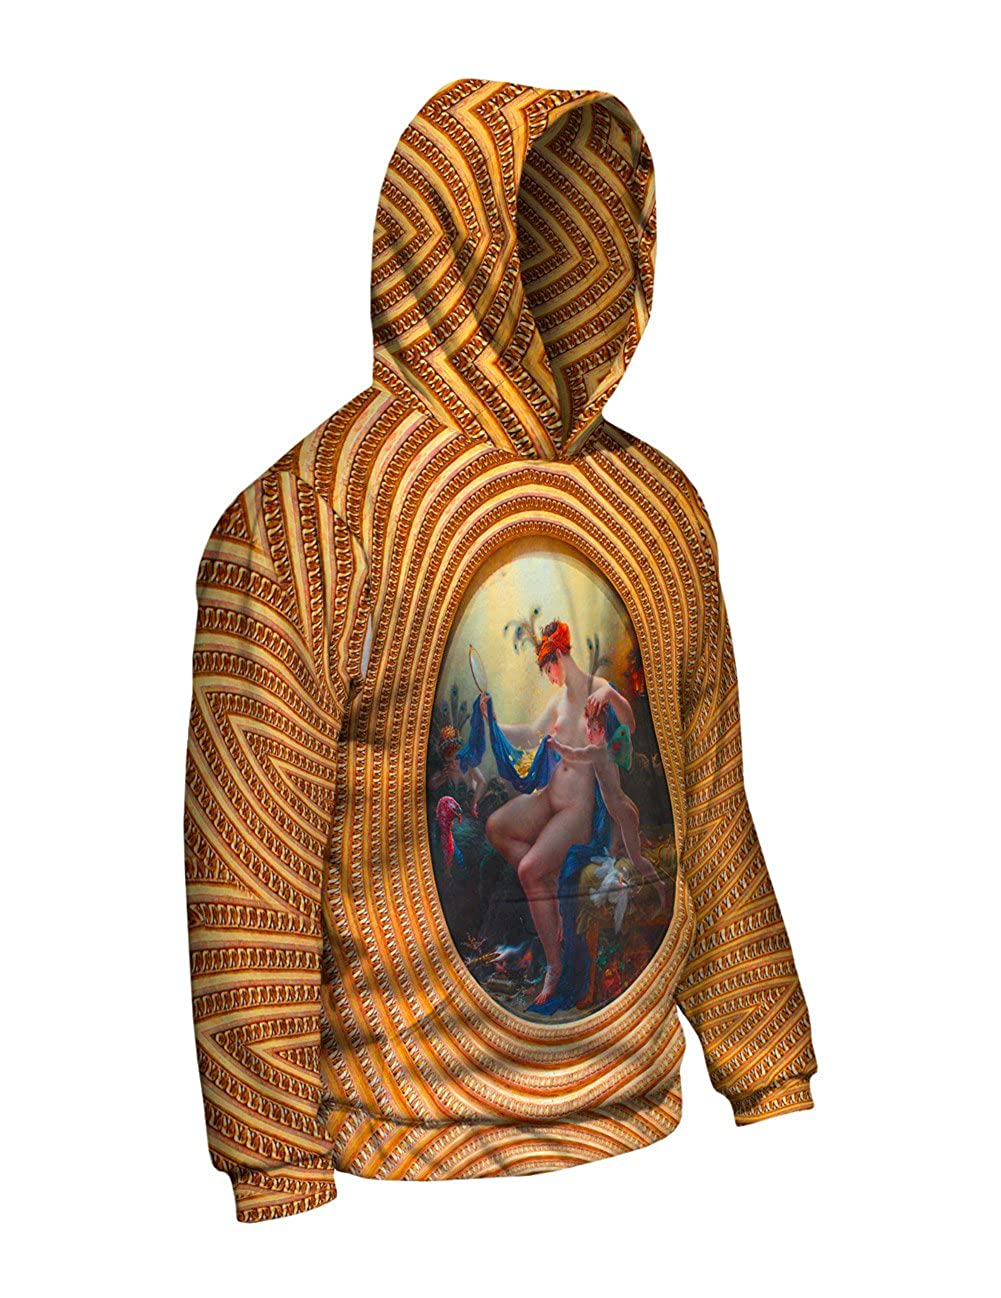 Made Mens Hoodie 2818 Yizzam- Anne Louis Girodet Trioson Allover Print